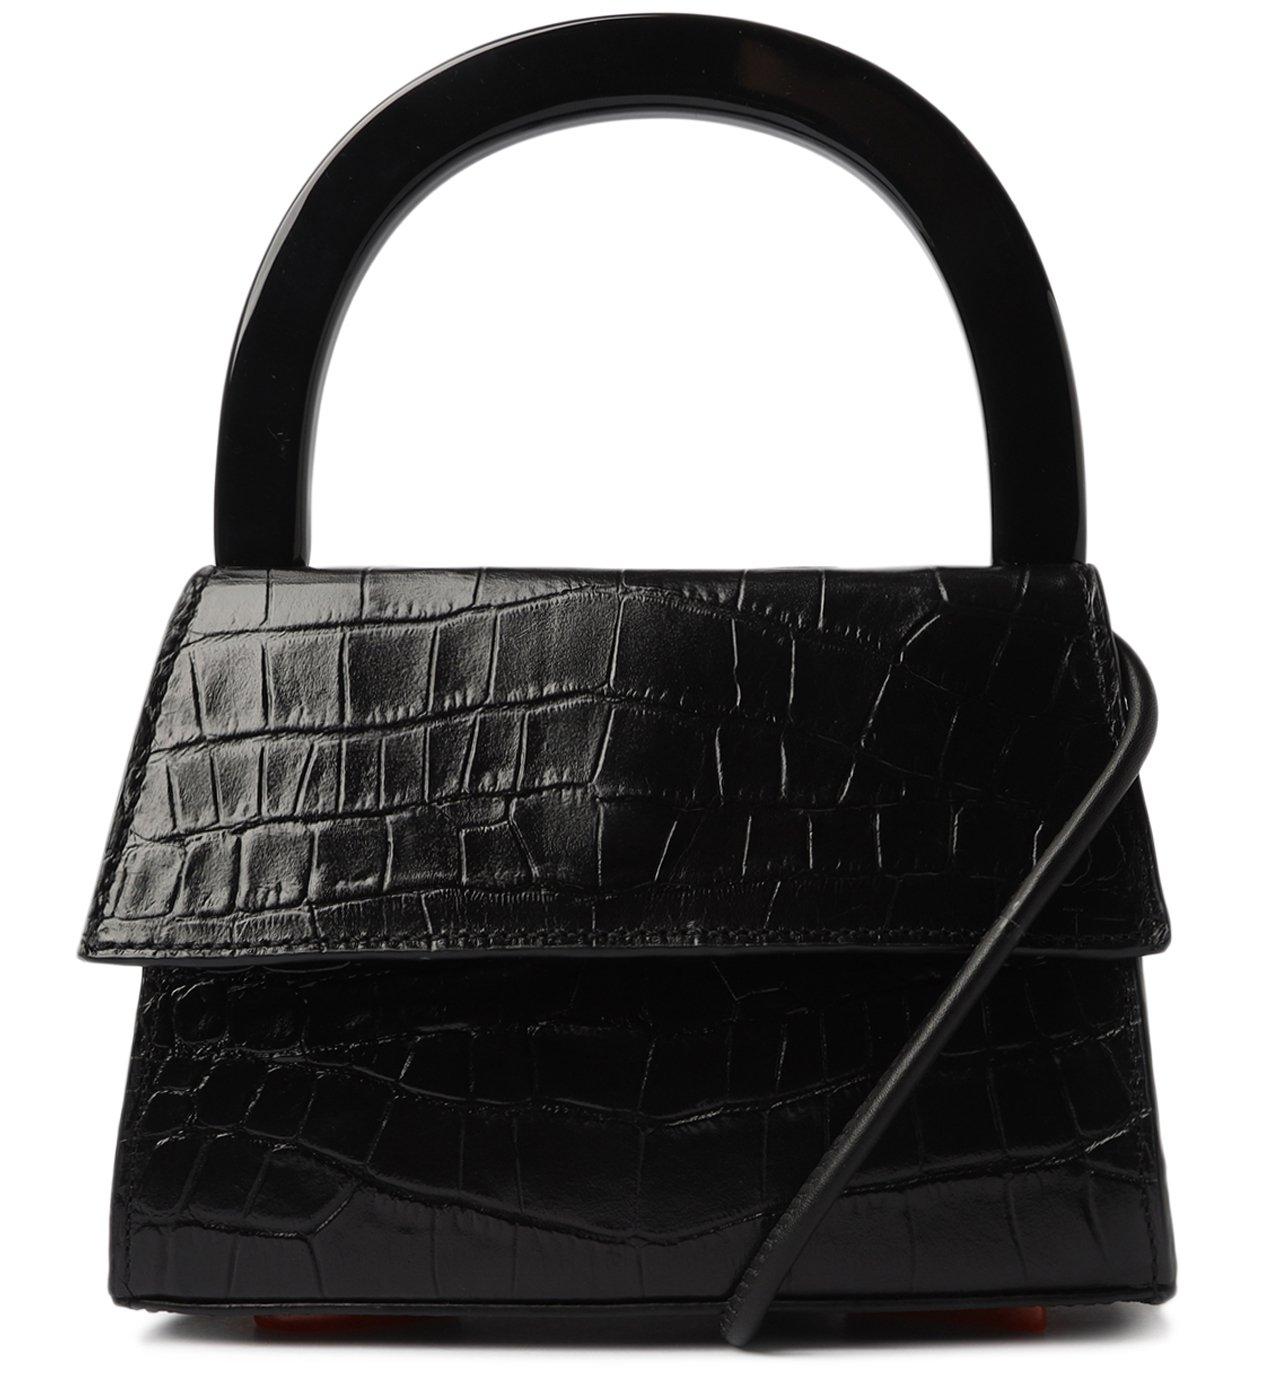 Schutz X Ginger Bolsa Top Handle Croco Black | Schutz